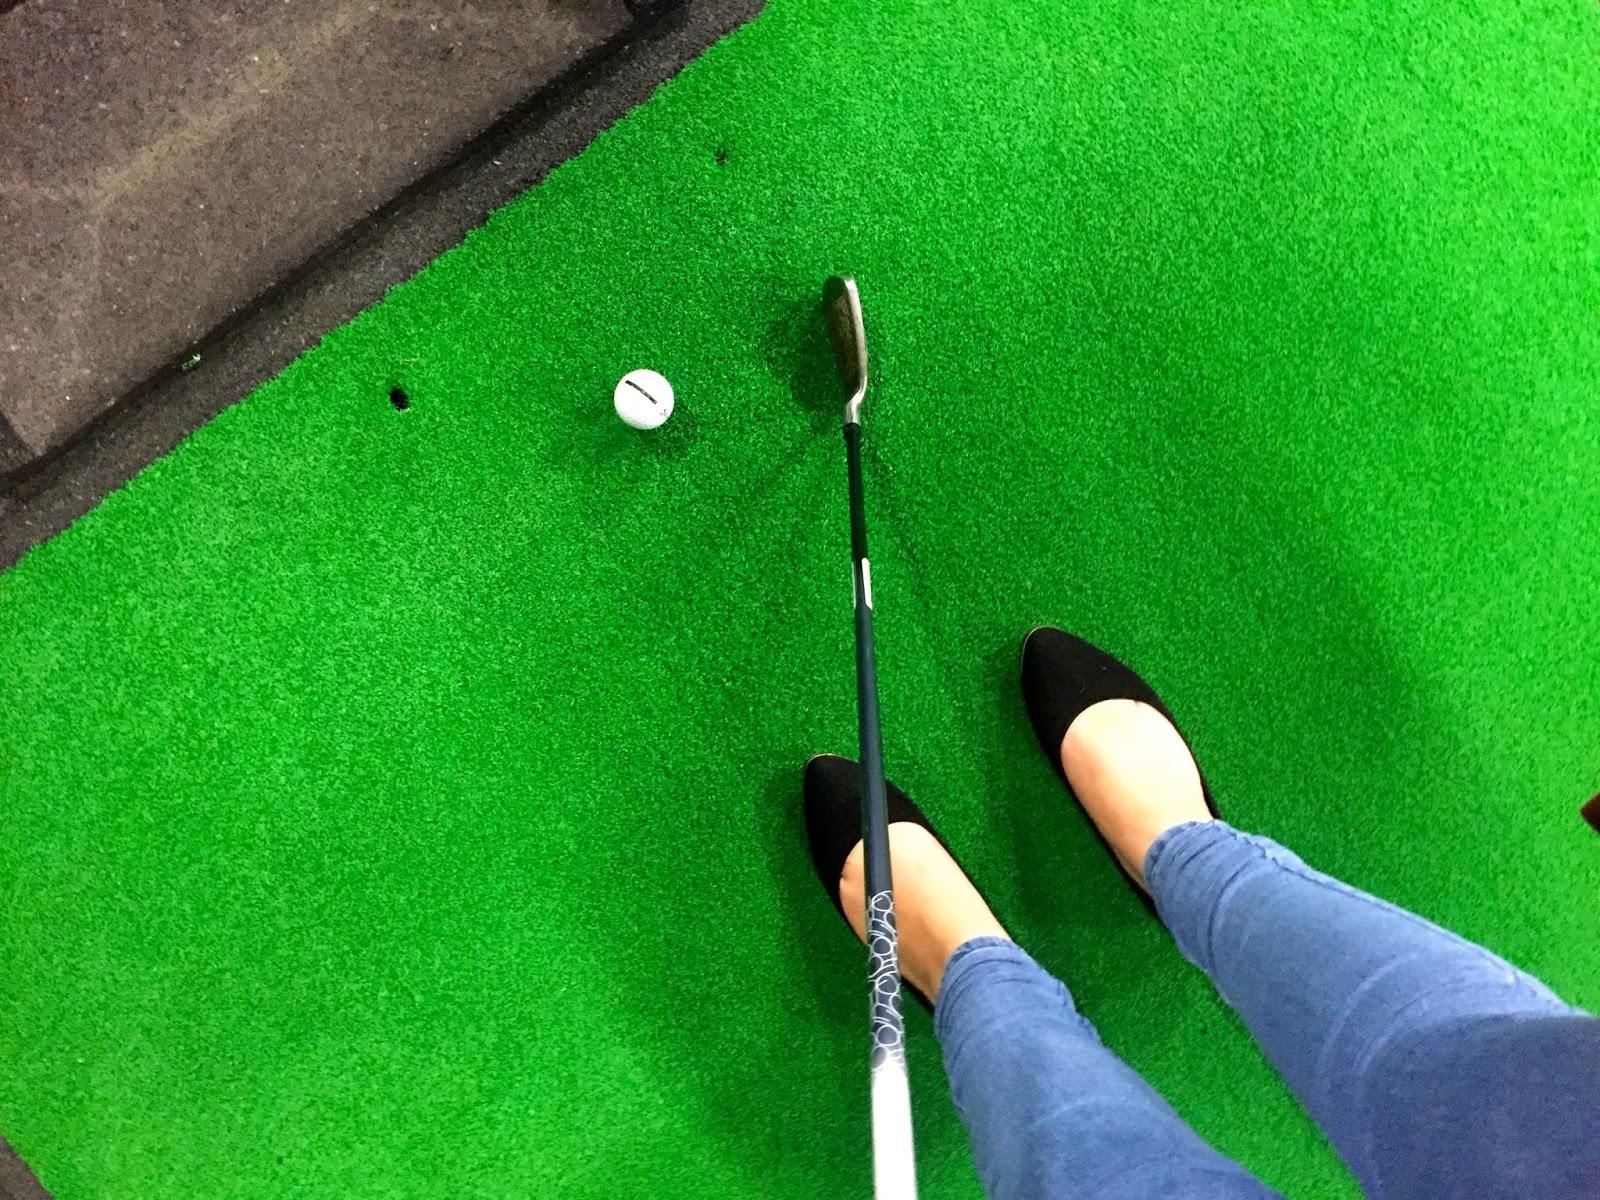 #GolfWithMonarch